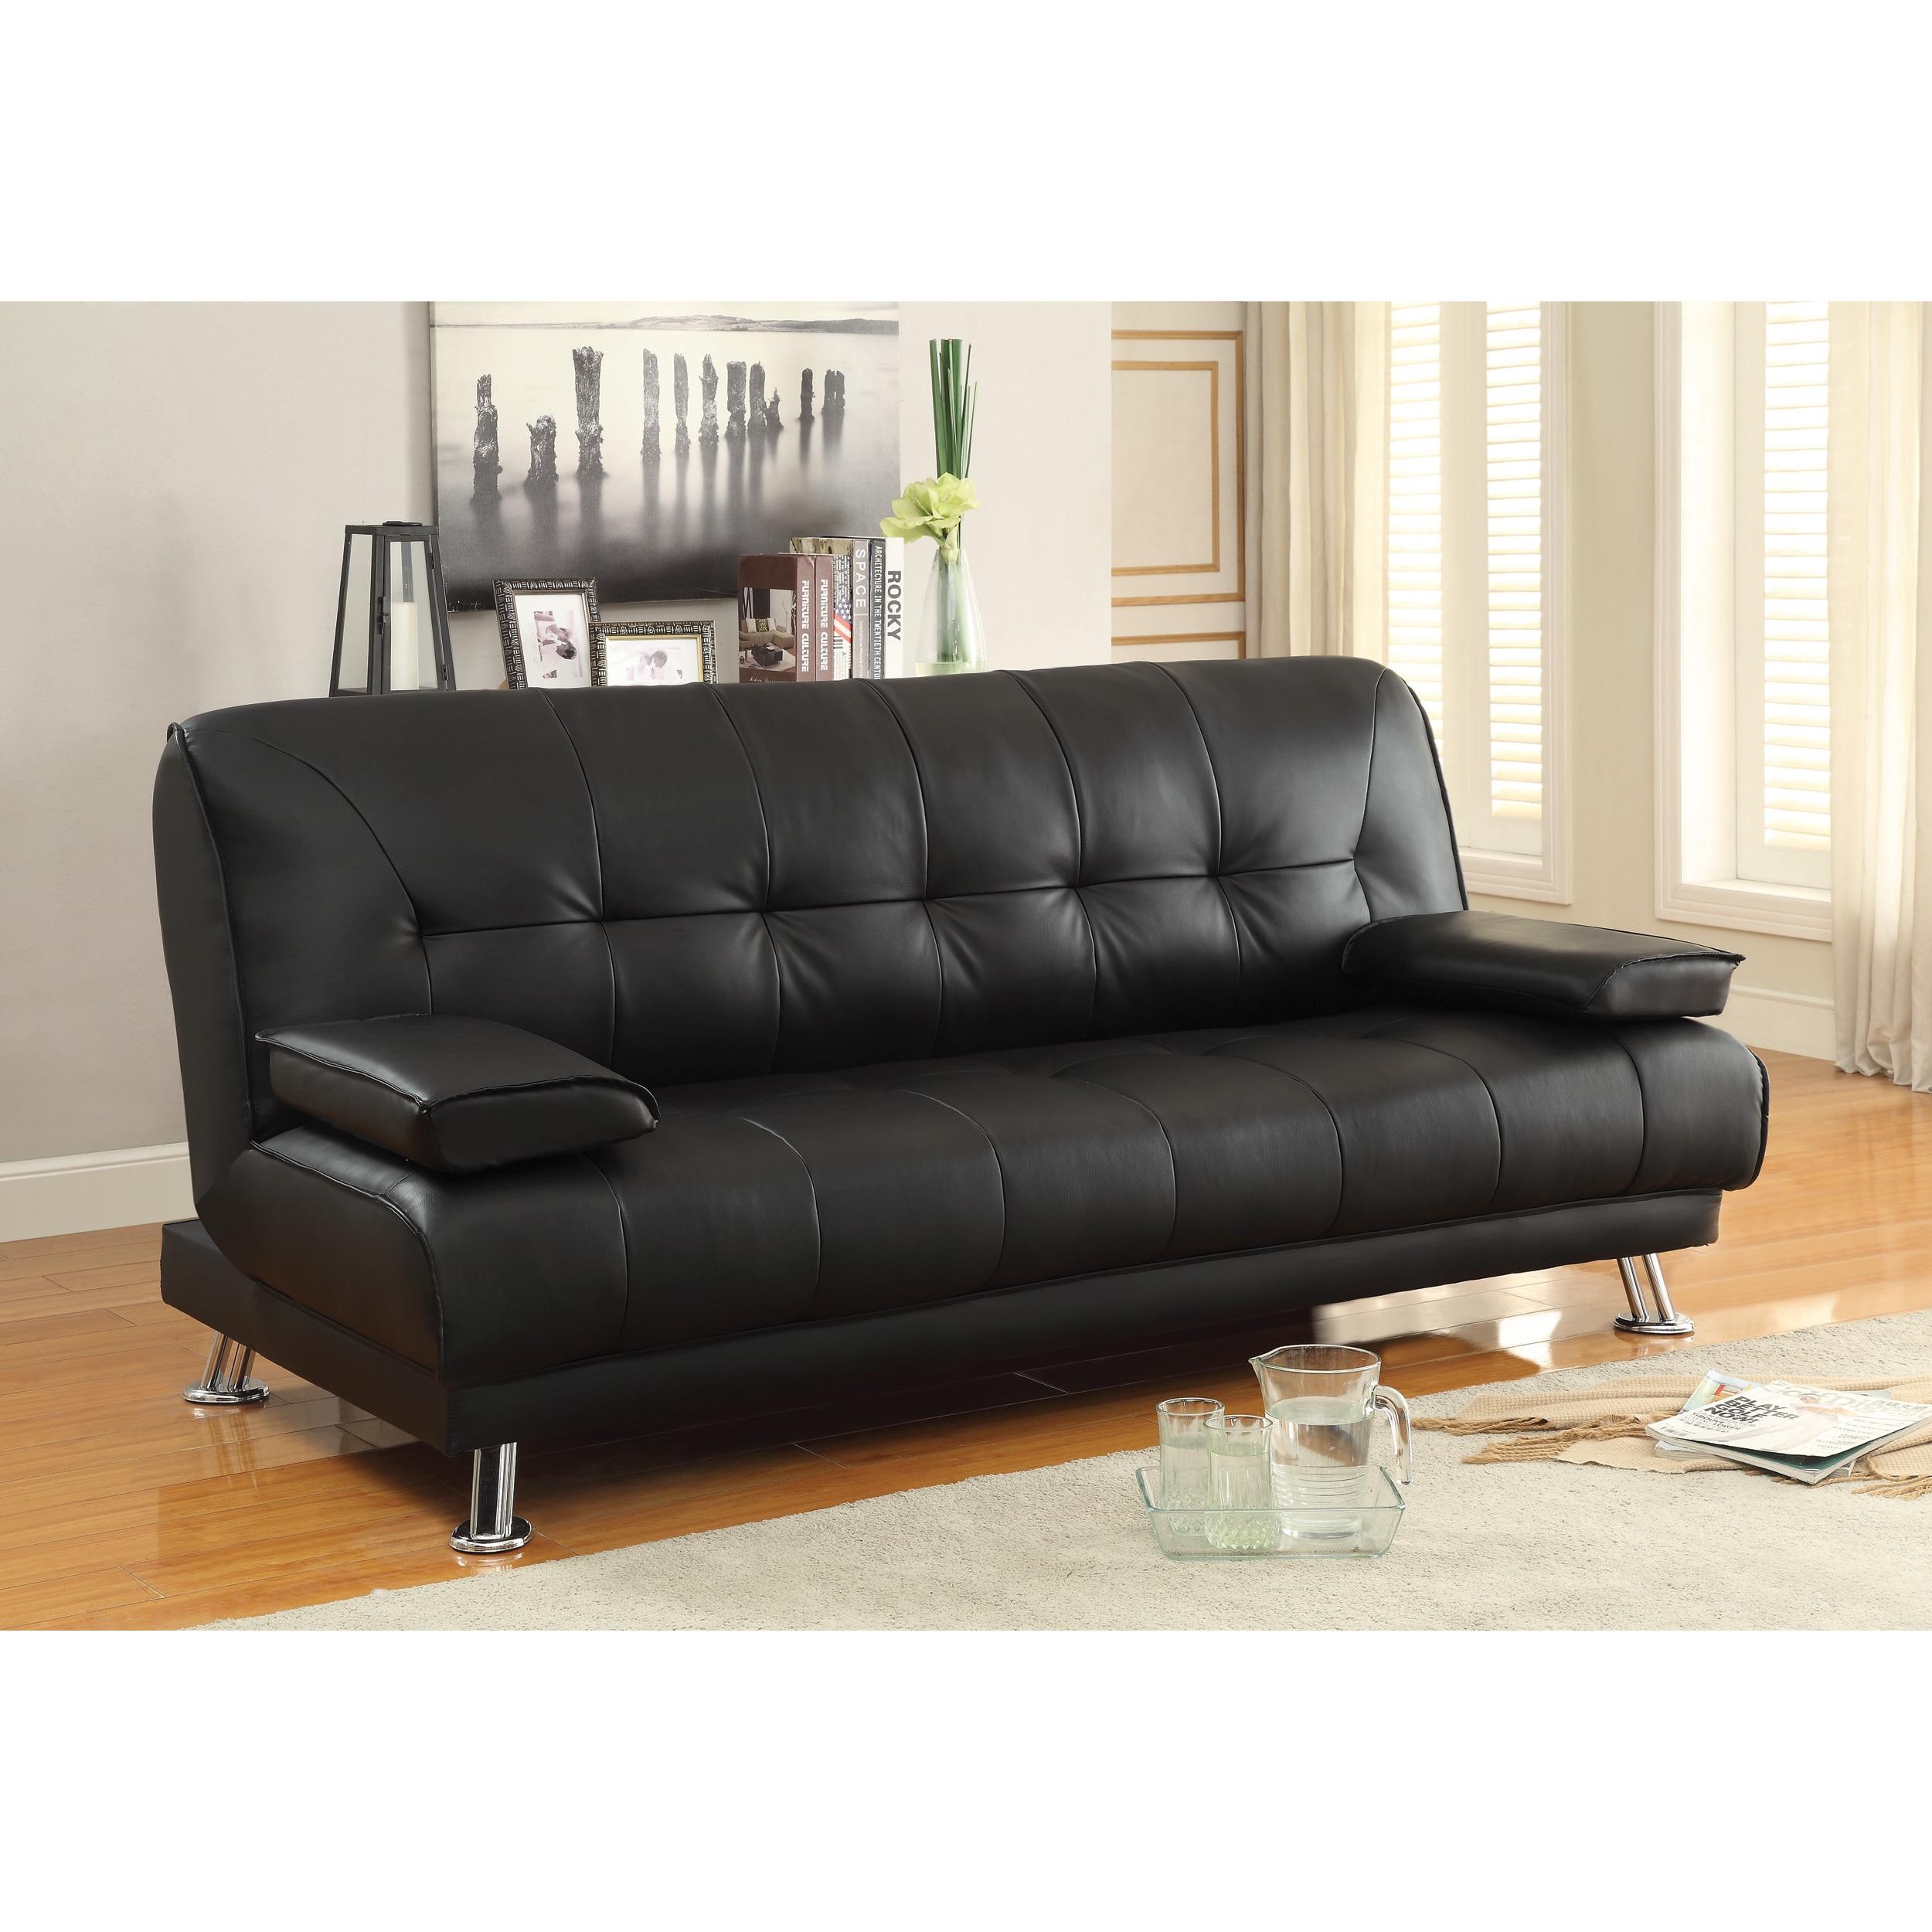 Coaster Furniture Black Leatherette Sofa Bed (Black)